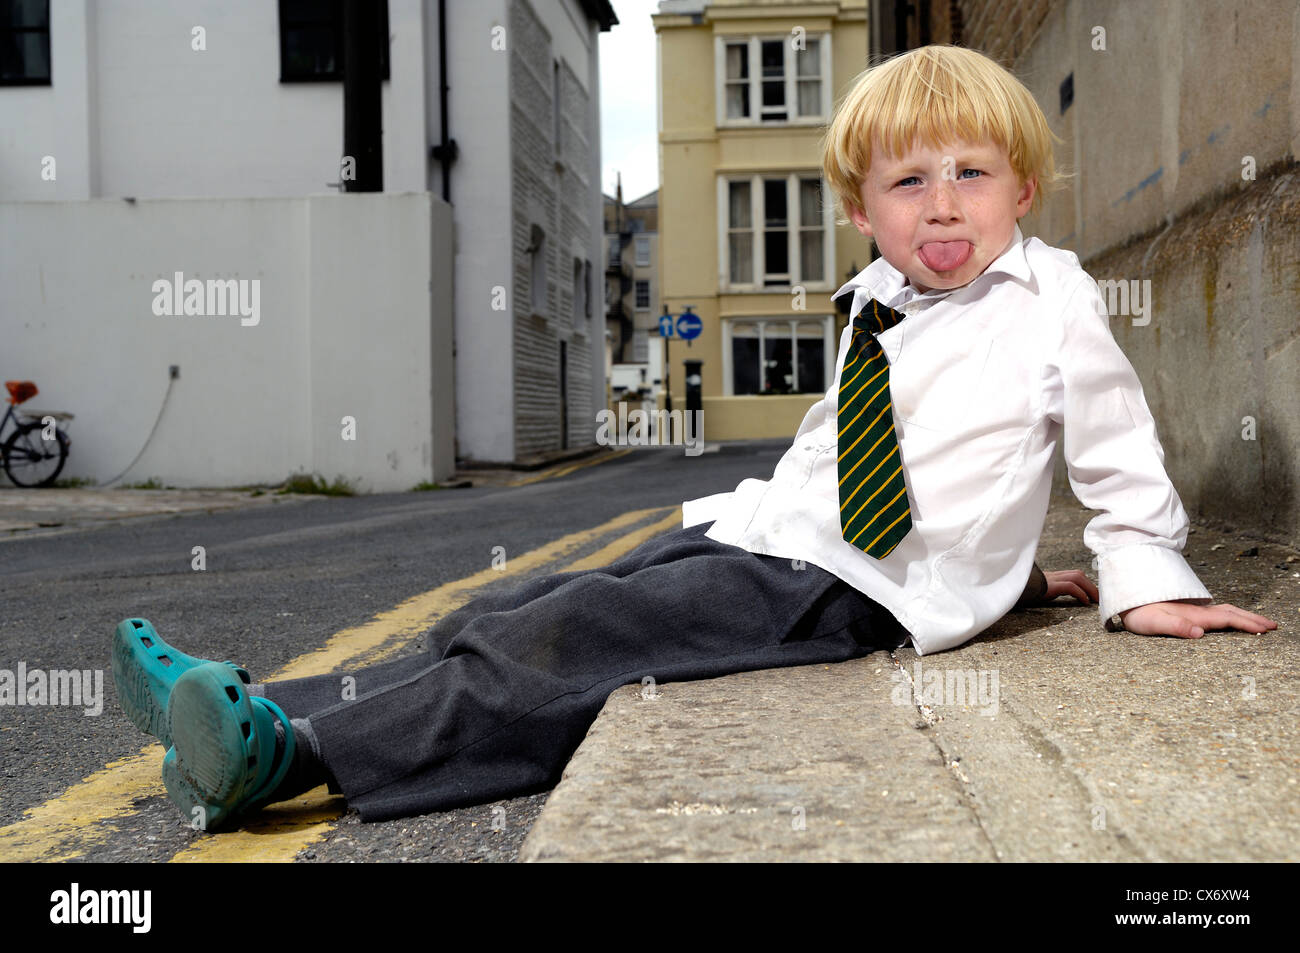 Boy Sitting on Curb - Stock Image